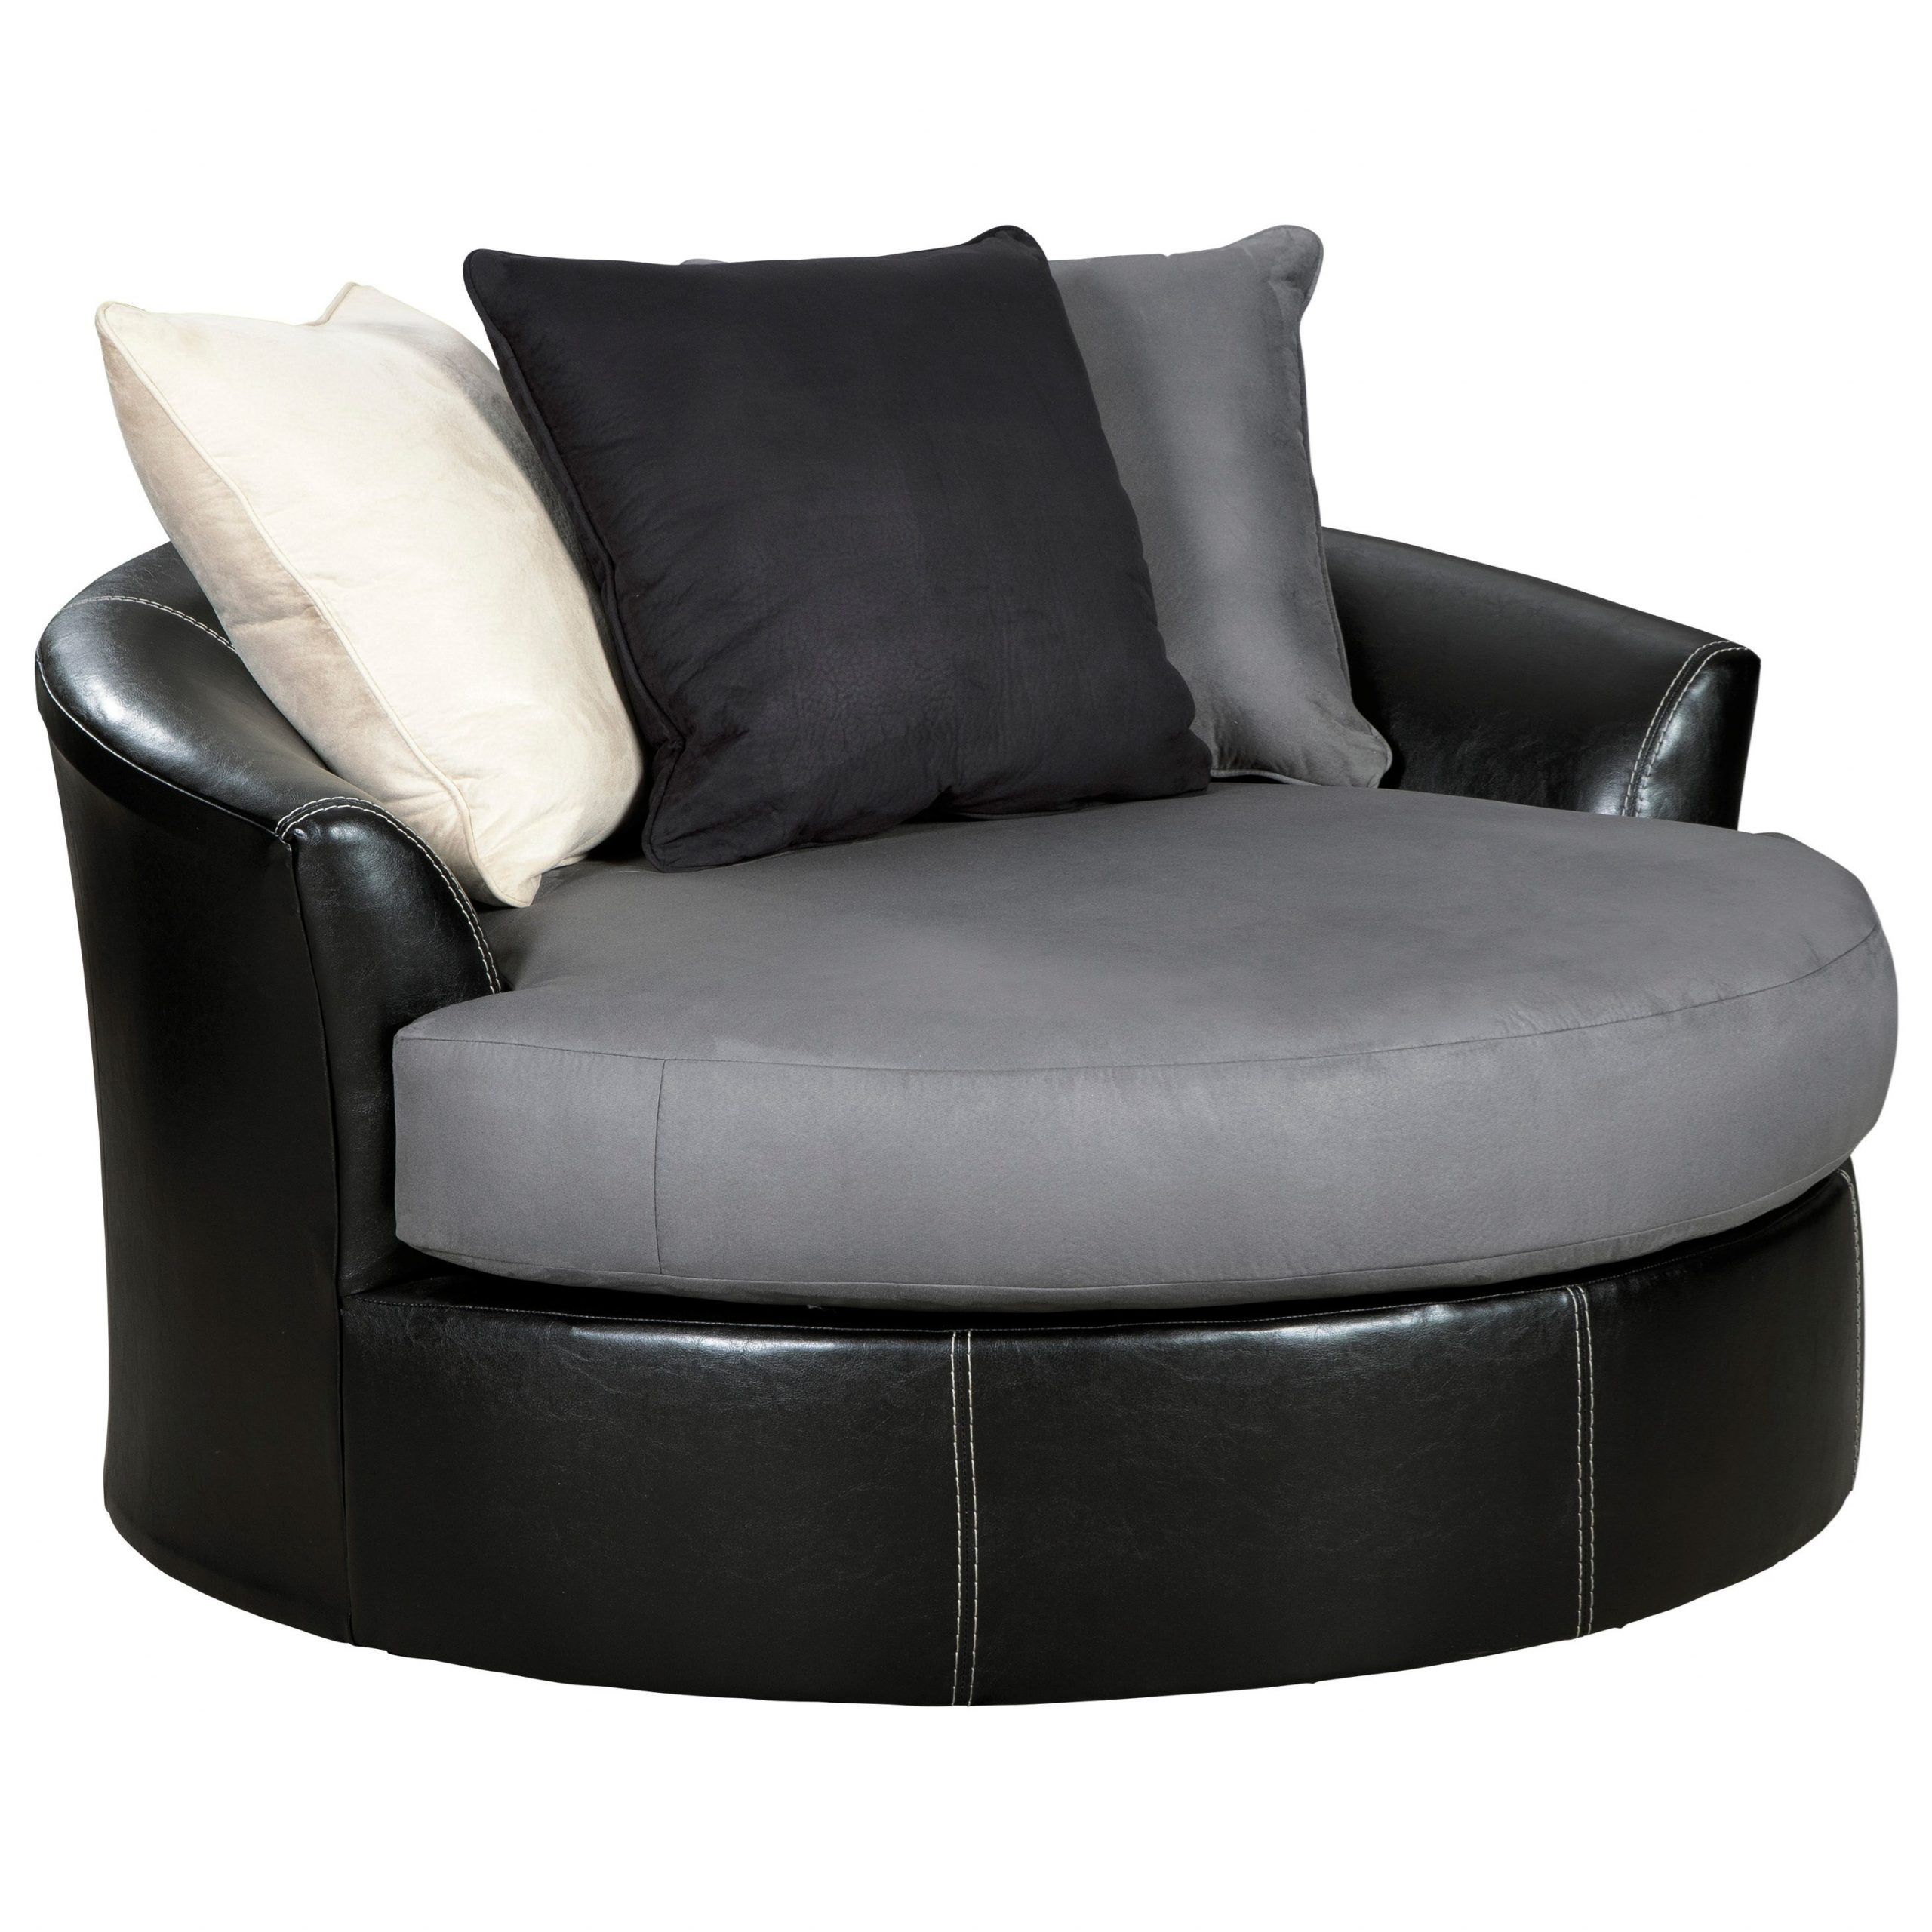 Signature Designashley Jacurso Contemporary Round Pertaining To Round Swivel Sofa Chairs (View 1 of 15)